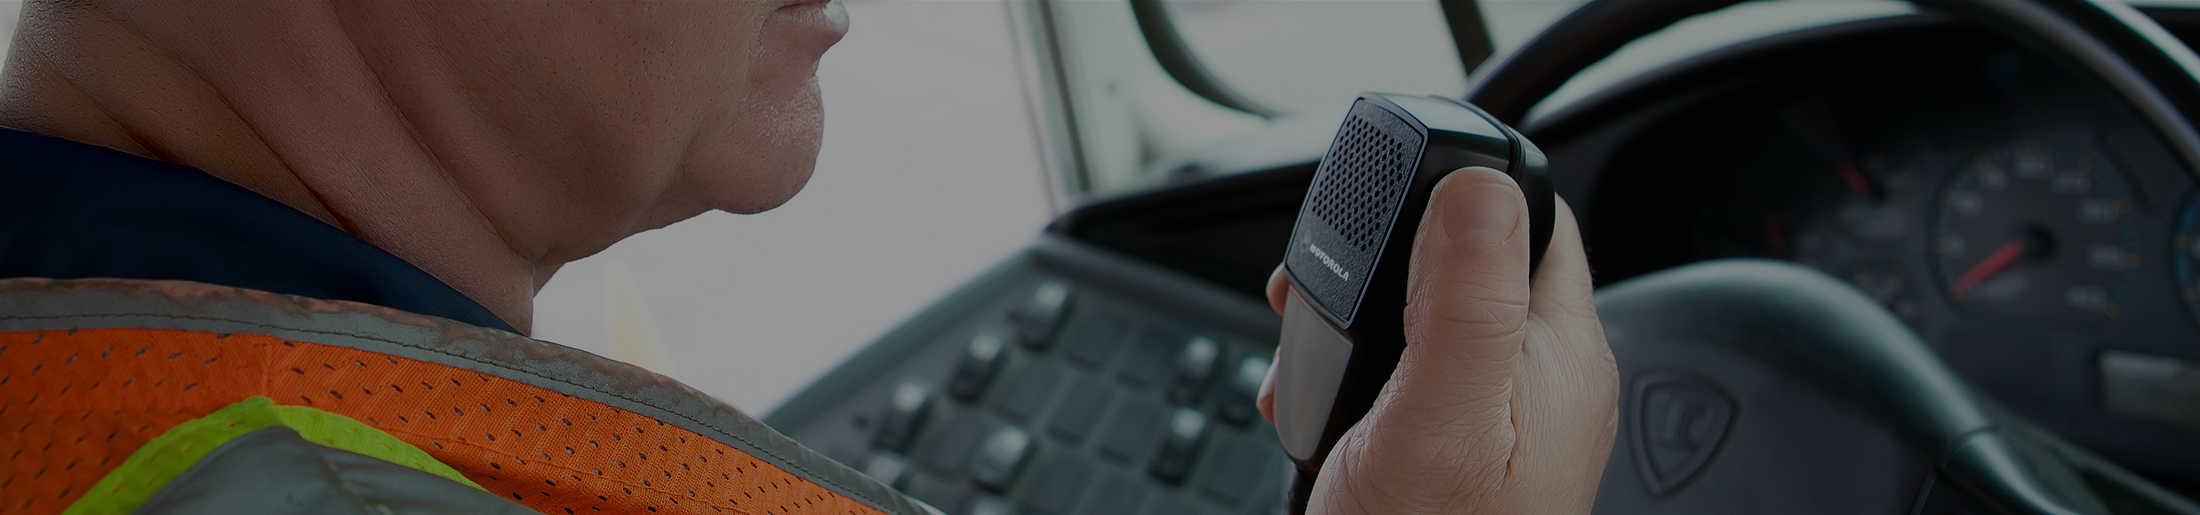 MOTOTRBO DM Mobile Case Study Image